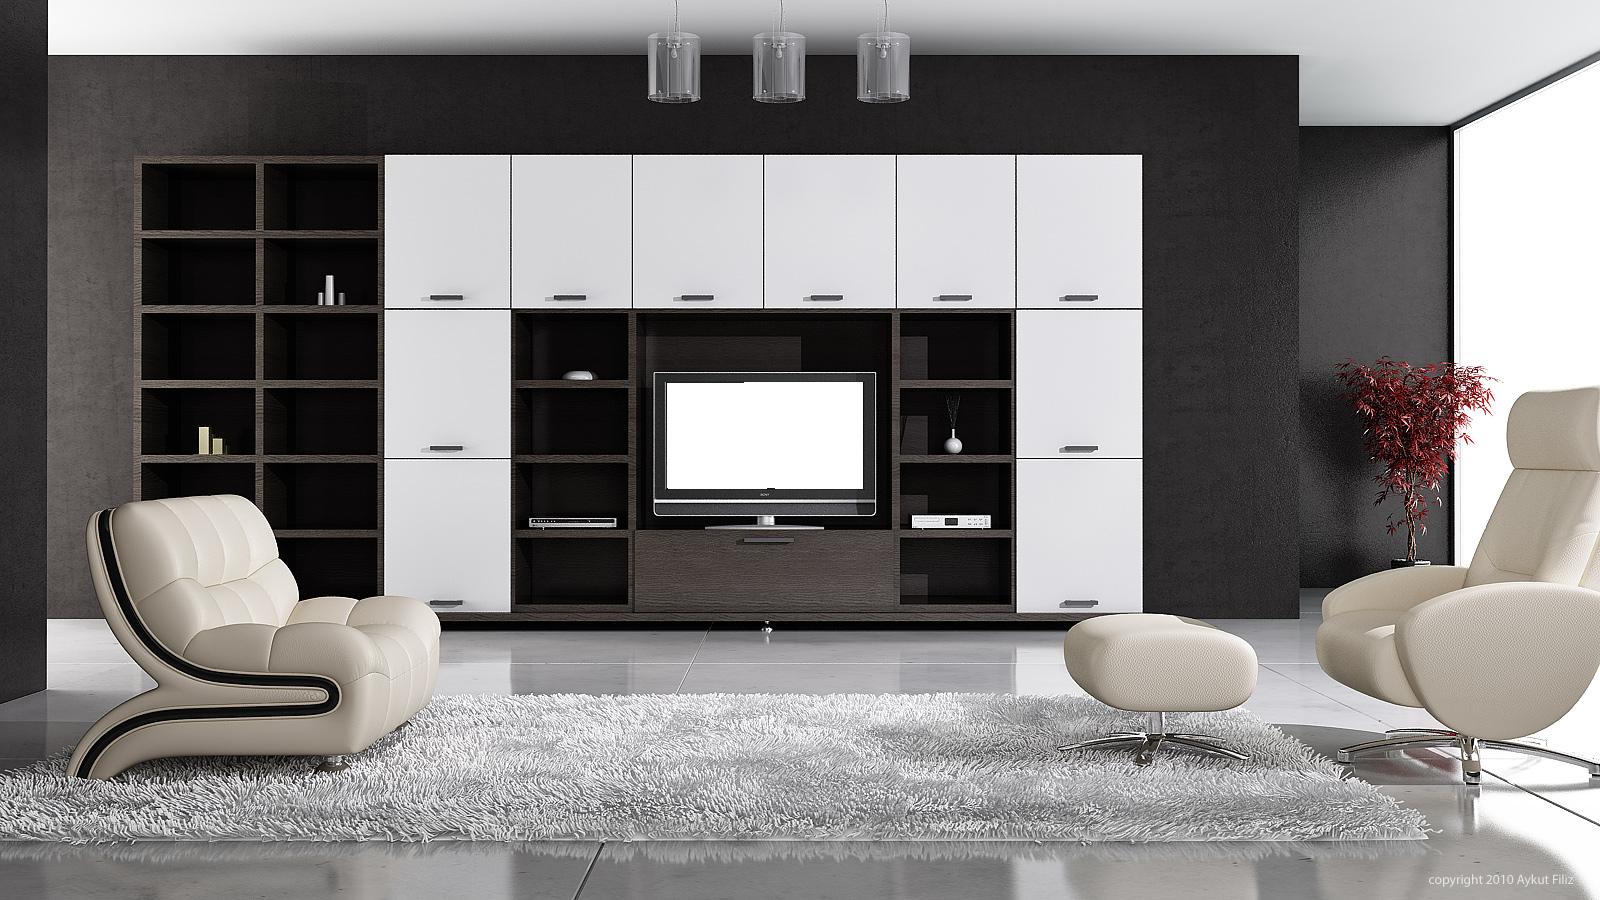 Living room png hd transparent living room hd png images - Interior design living room wallpaper ...